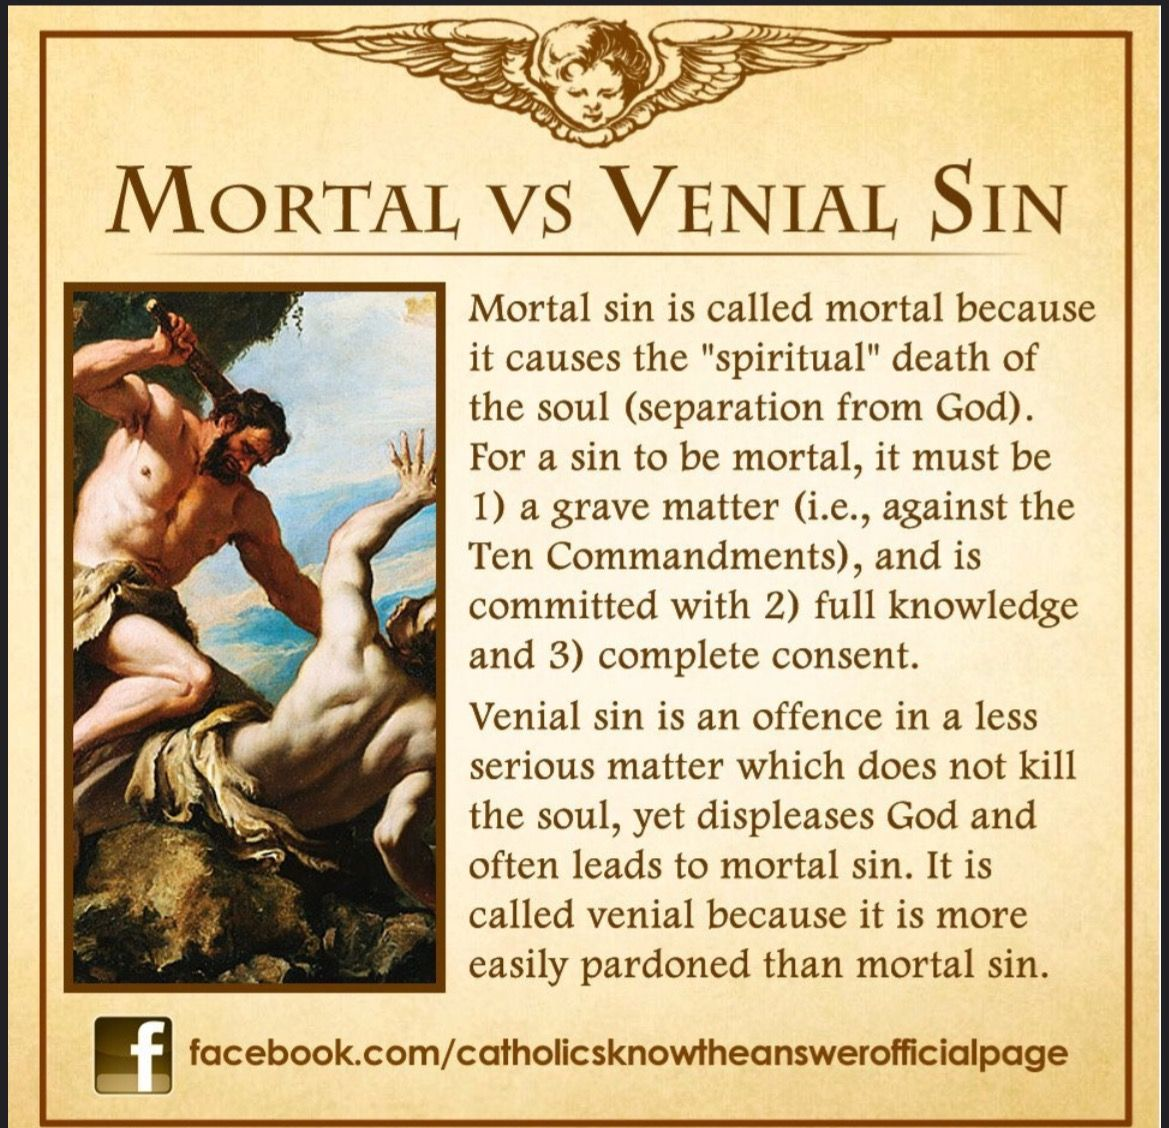 masturbation why sin mortal is a